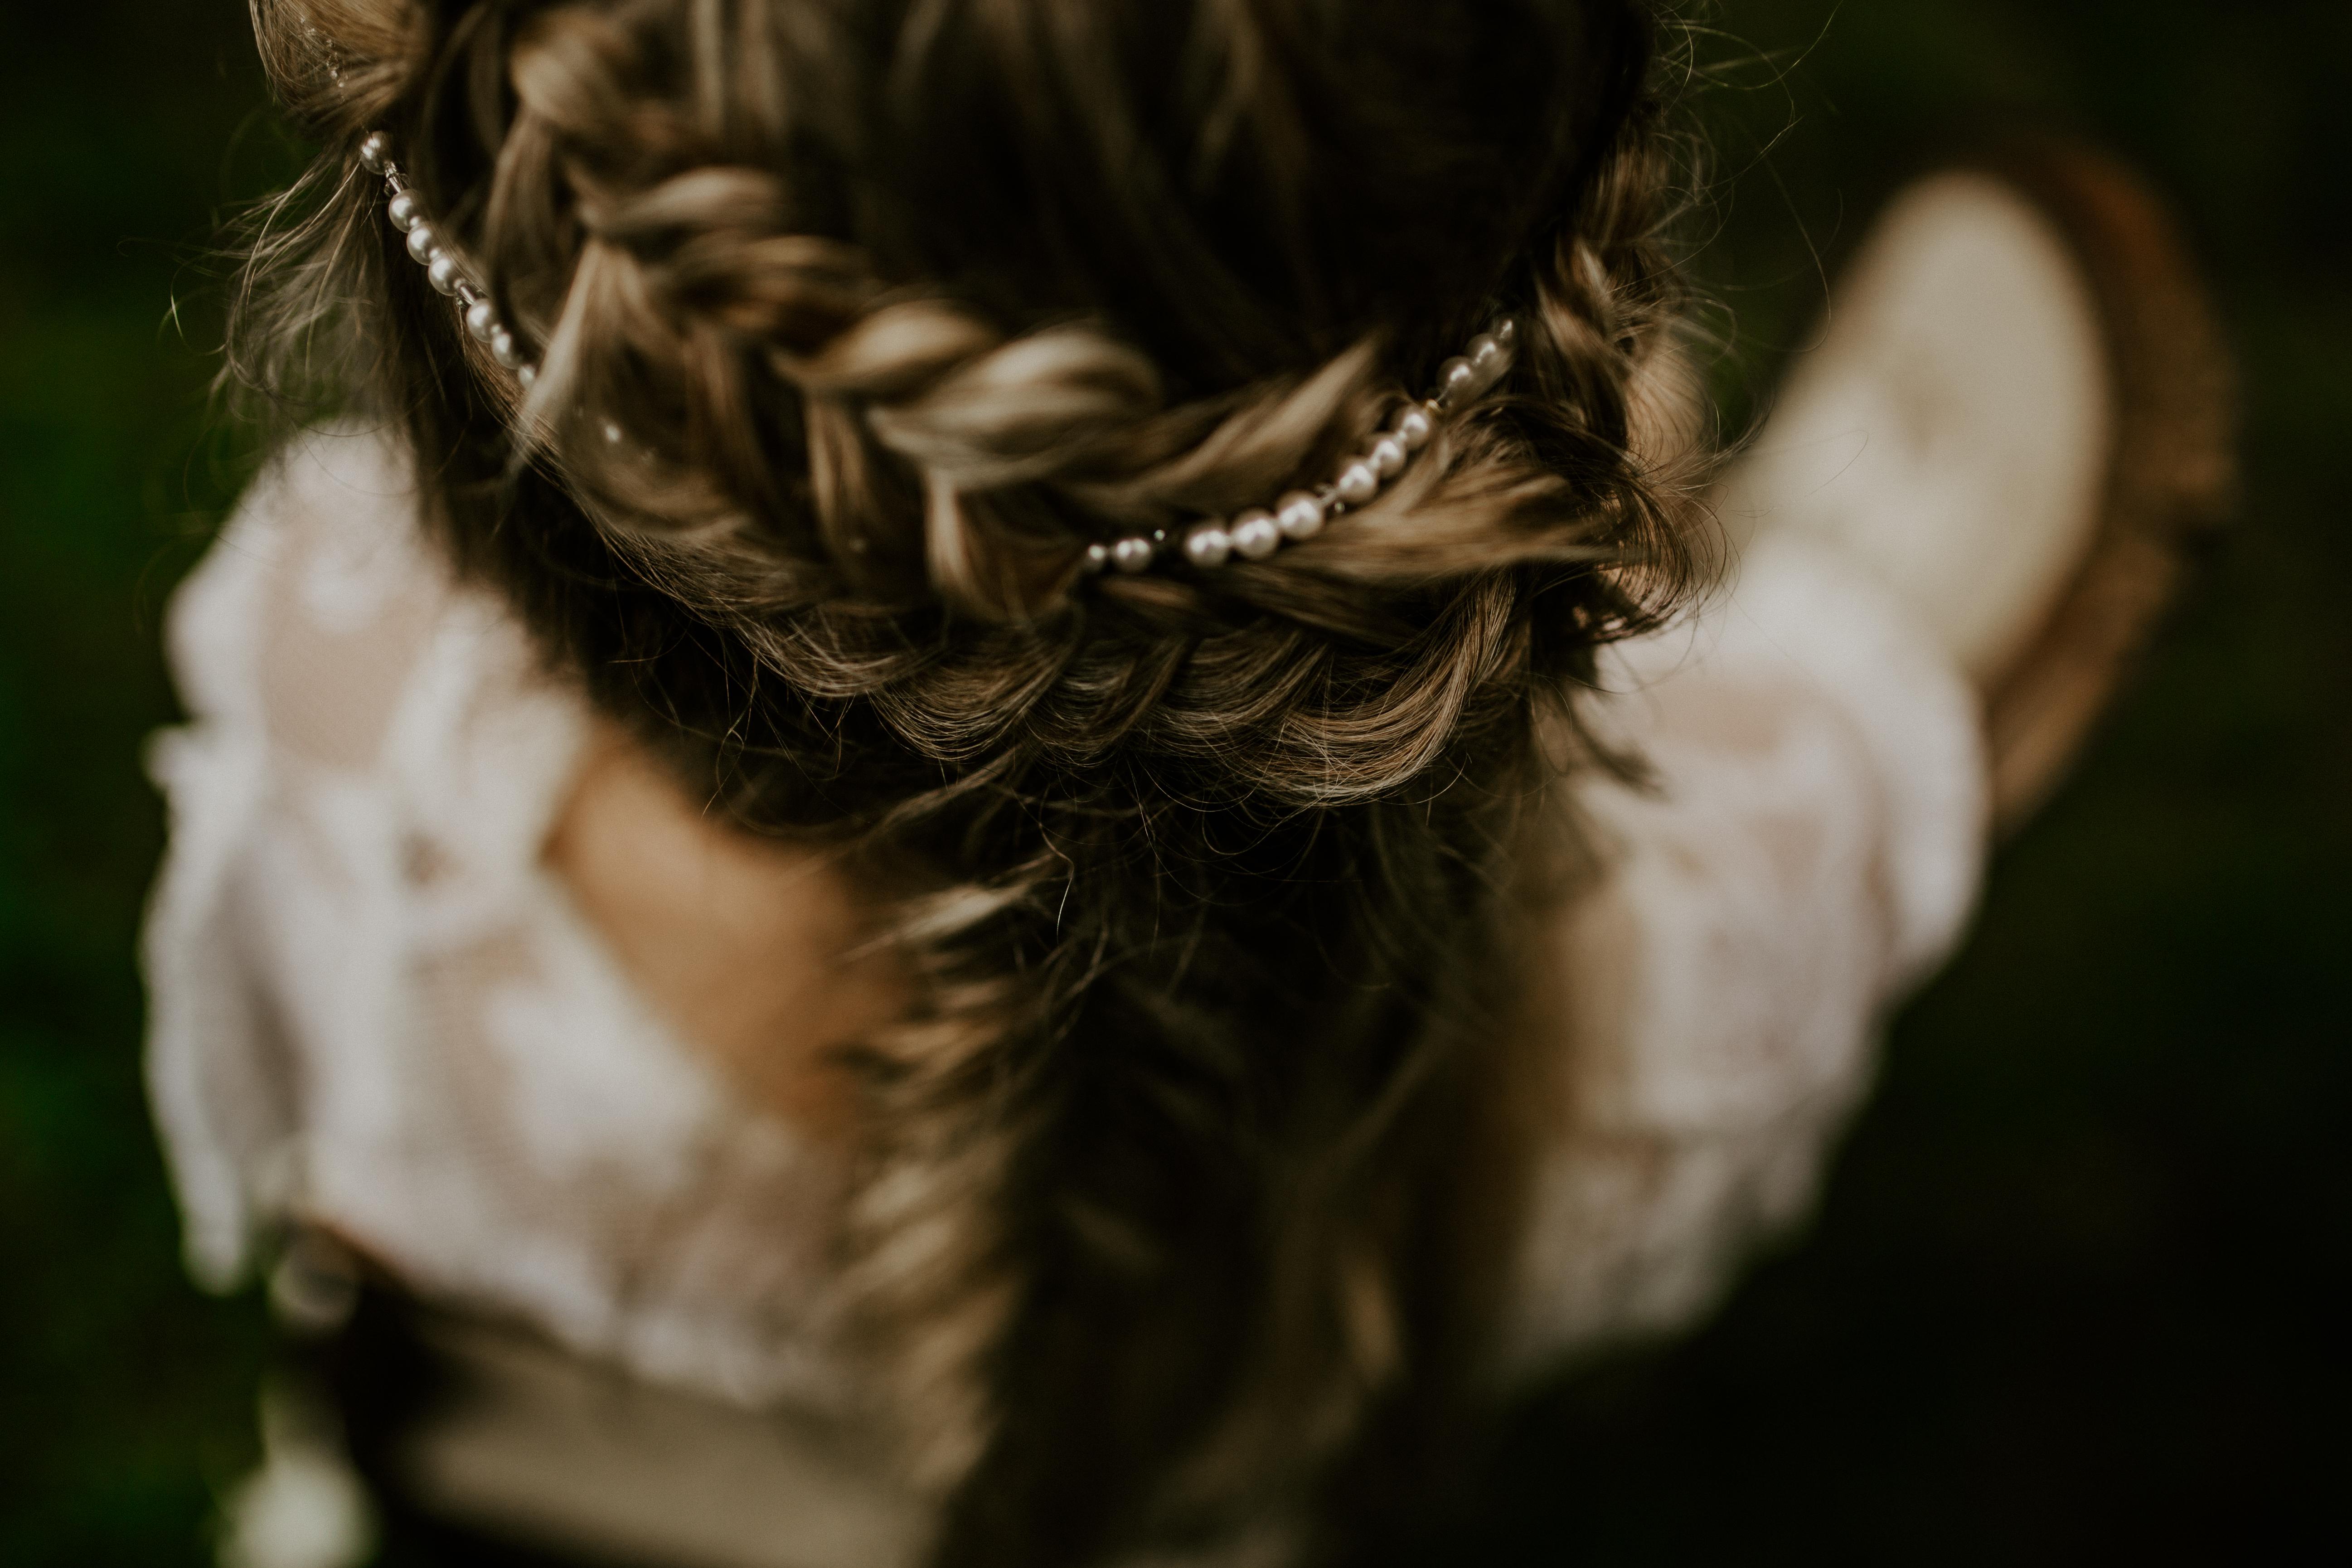 Into the wild hair